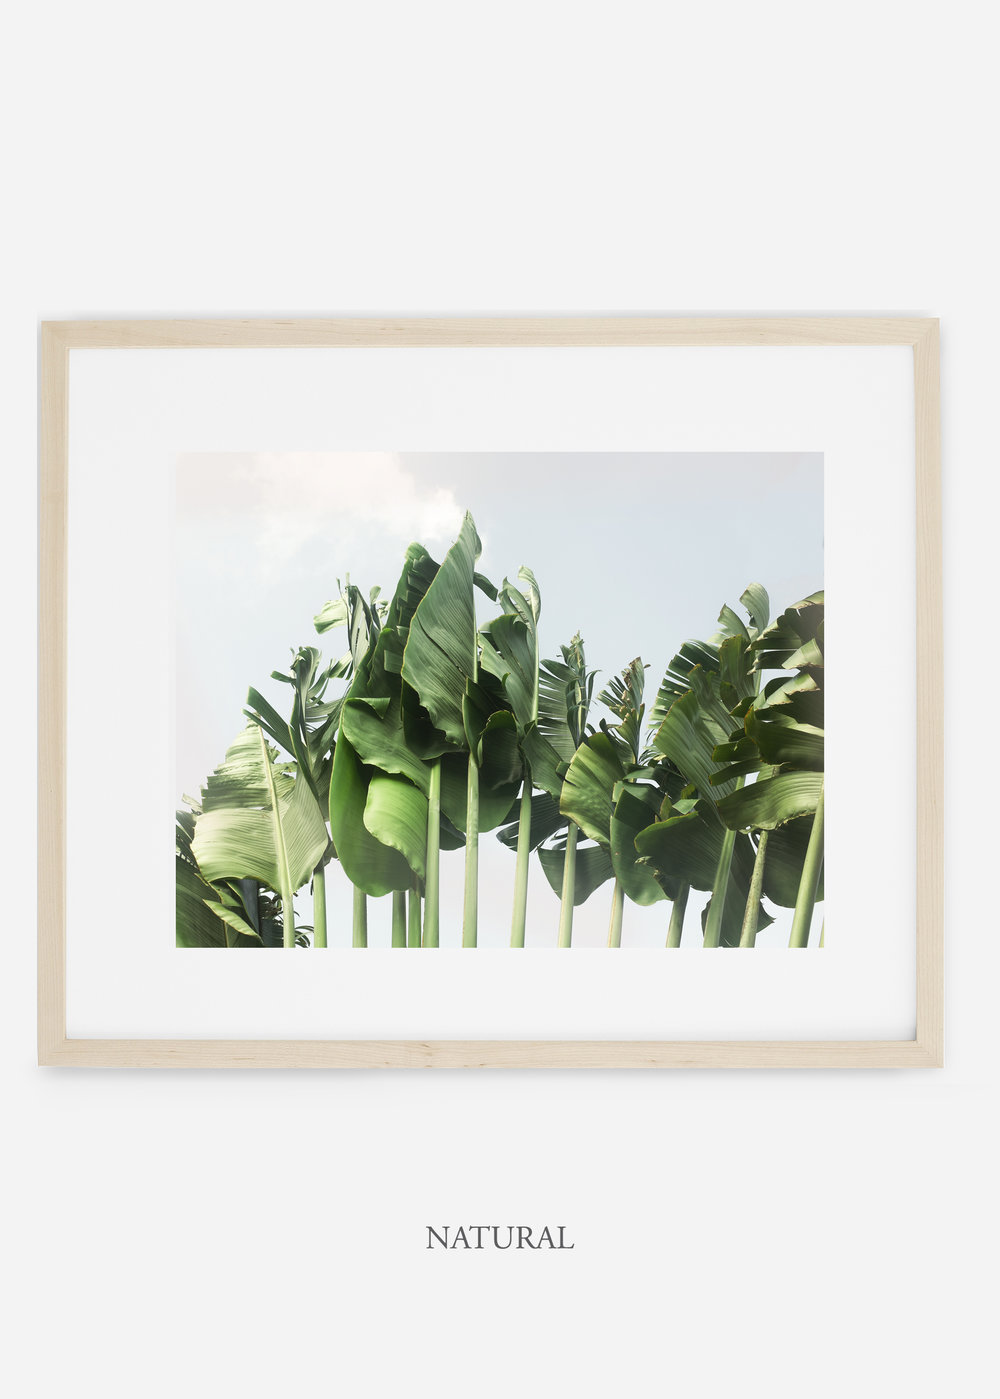 wildercalifornia_naturalframe_tulum_bananaleaf_No.1_minimal_cactus_art_interiordesign_blackandwhite.jpg